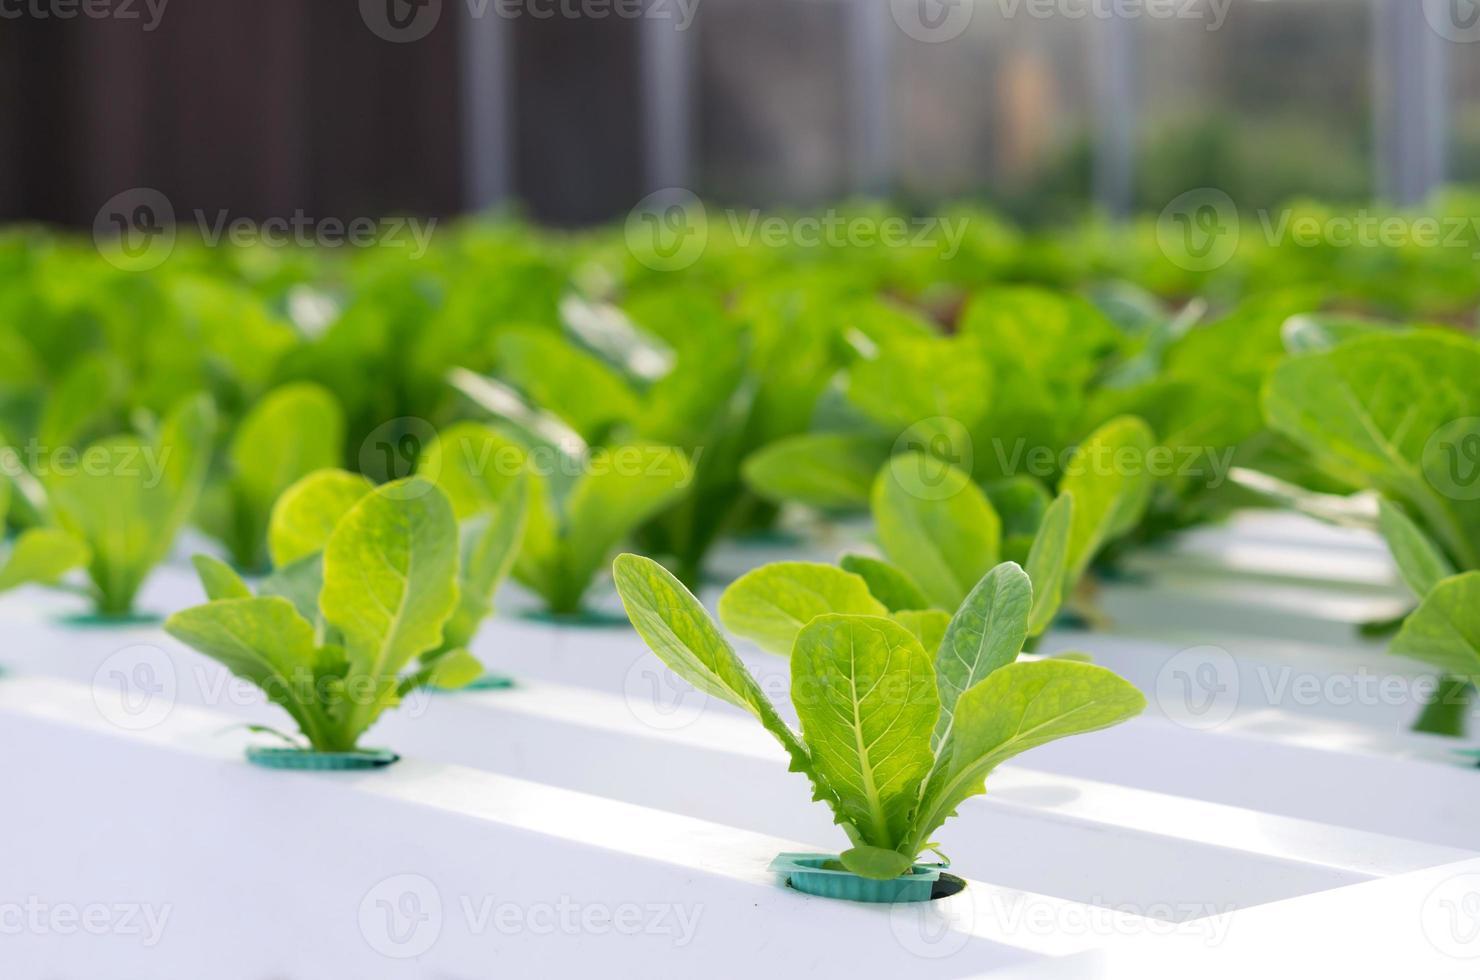 vegetal hidropónico en granja foto